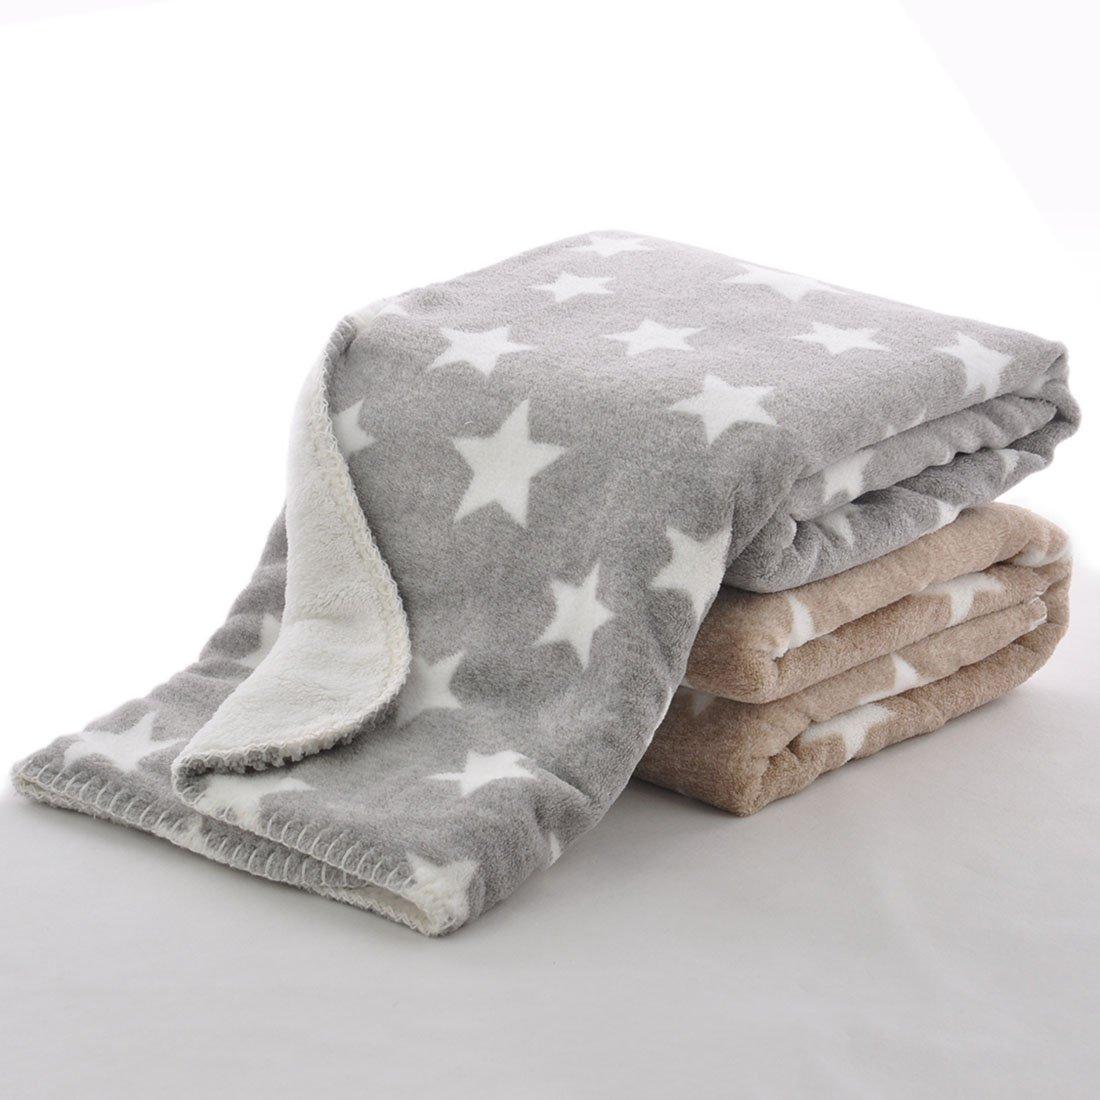 YUENA CARE Baby Blanket Soft Kids Coral FLeece Blanket Plush Star Toddler Blanket 2 Layer Brown